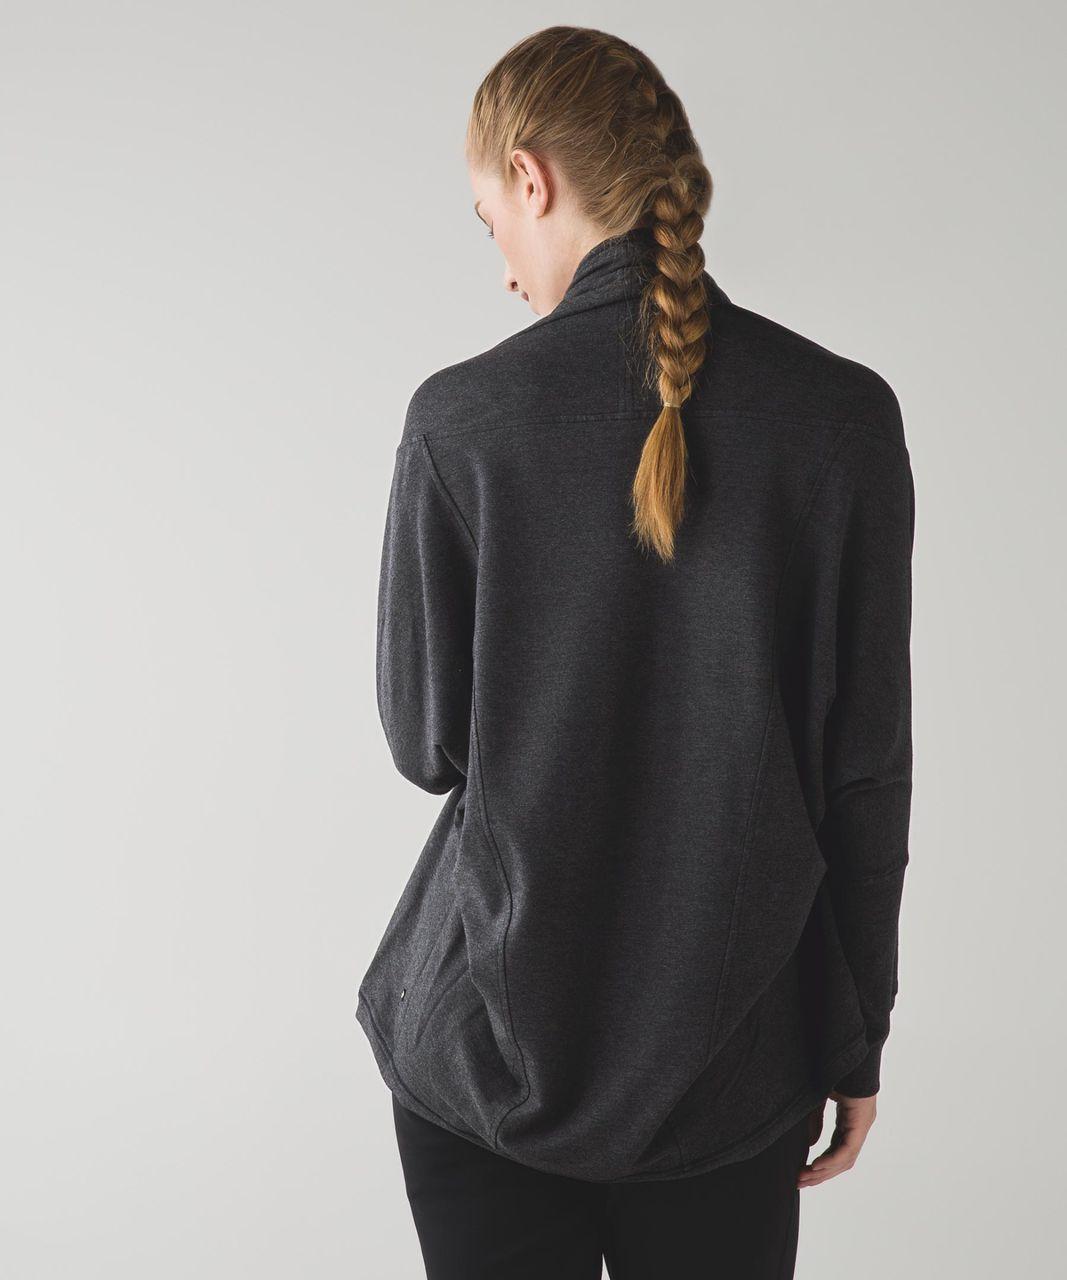 Lululemon To & Flow Wrap - Heathered Mod Black